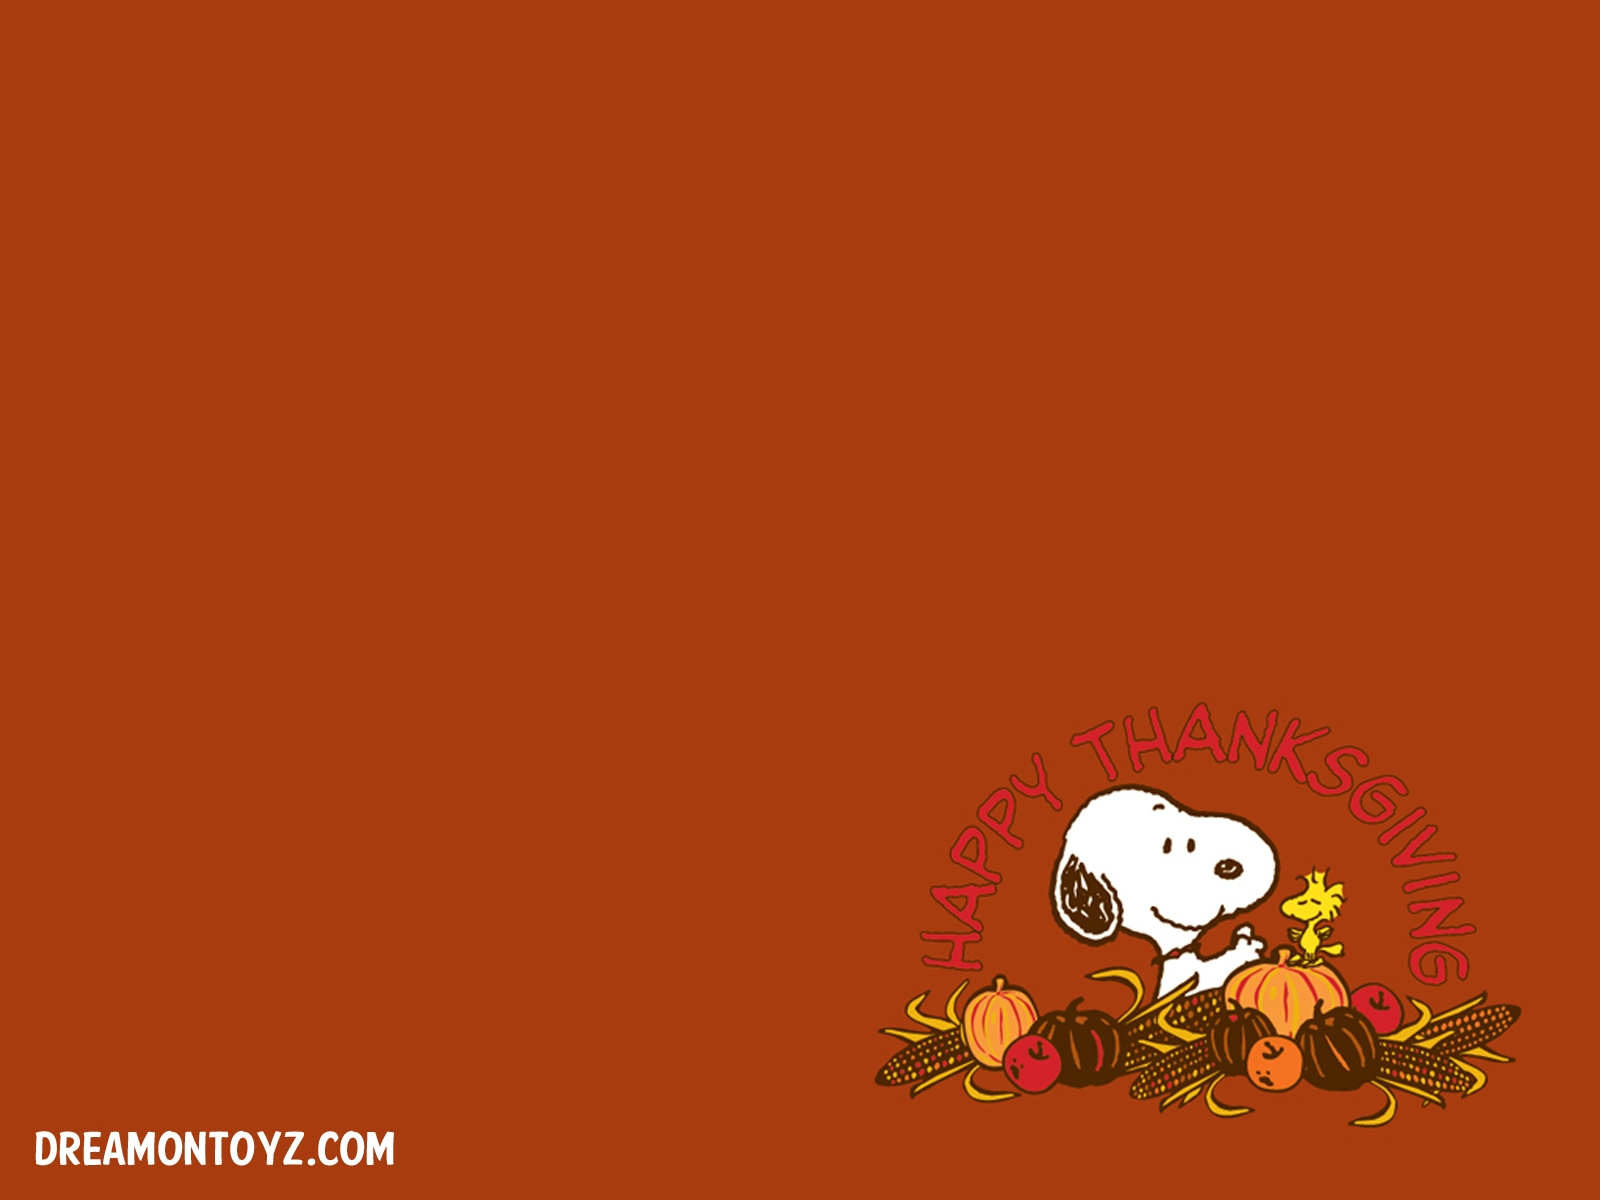 thanksgiving wallpapers 01234 - baltana